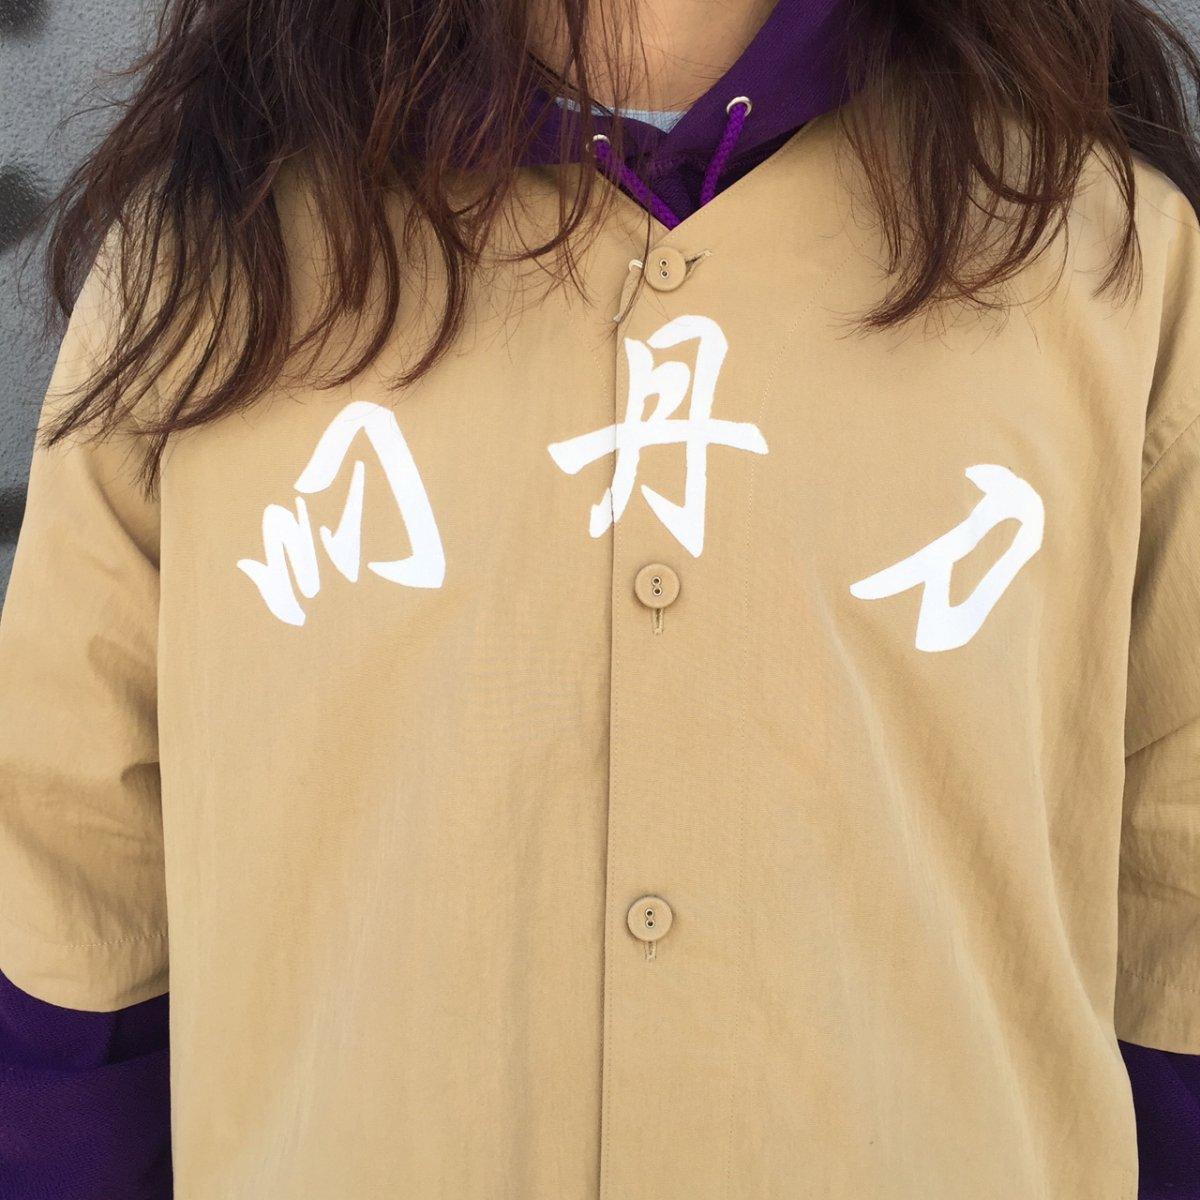 <img class='new_mark_img1' src='https://img.shop-pro.jp/img/new/icons24.gif' style='border:none;display:inline;margin:0px;padding:0px;width:auto;' />【SALE / 30%OFF】Black weirdos  ブラック ウィドー / シャツ Baseball Shirt 【BEIGE】